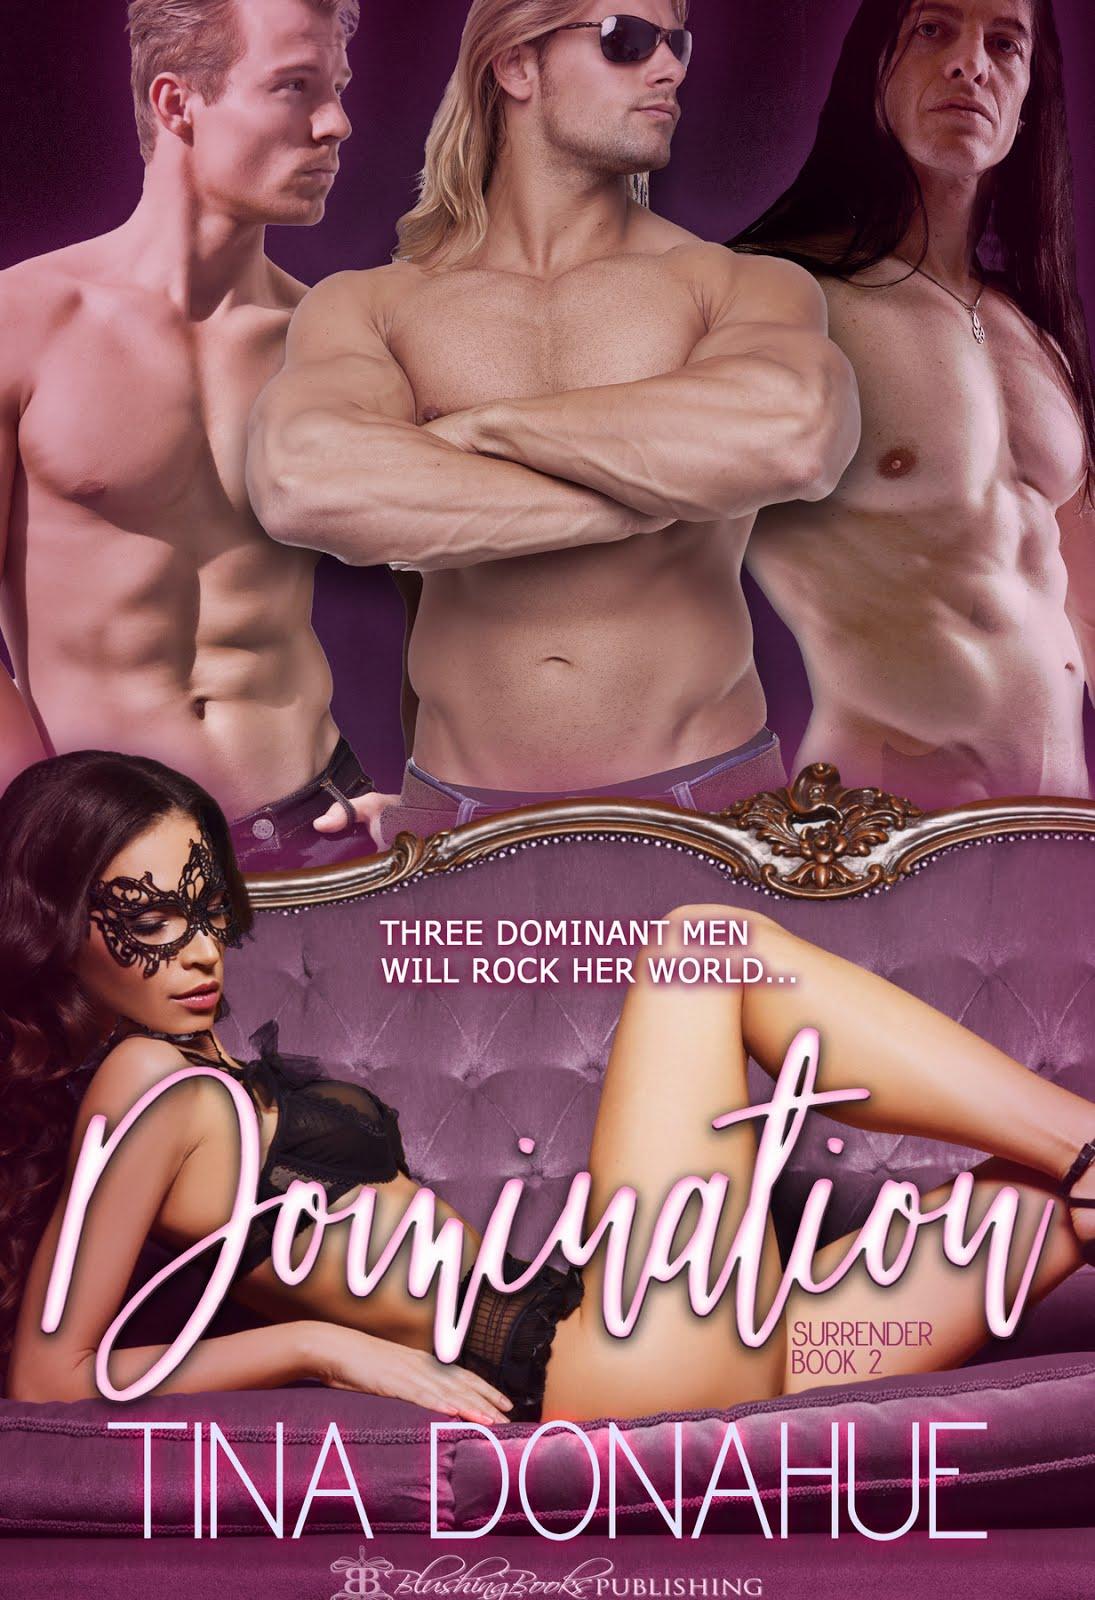 Domination (Surrender book 2)